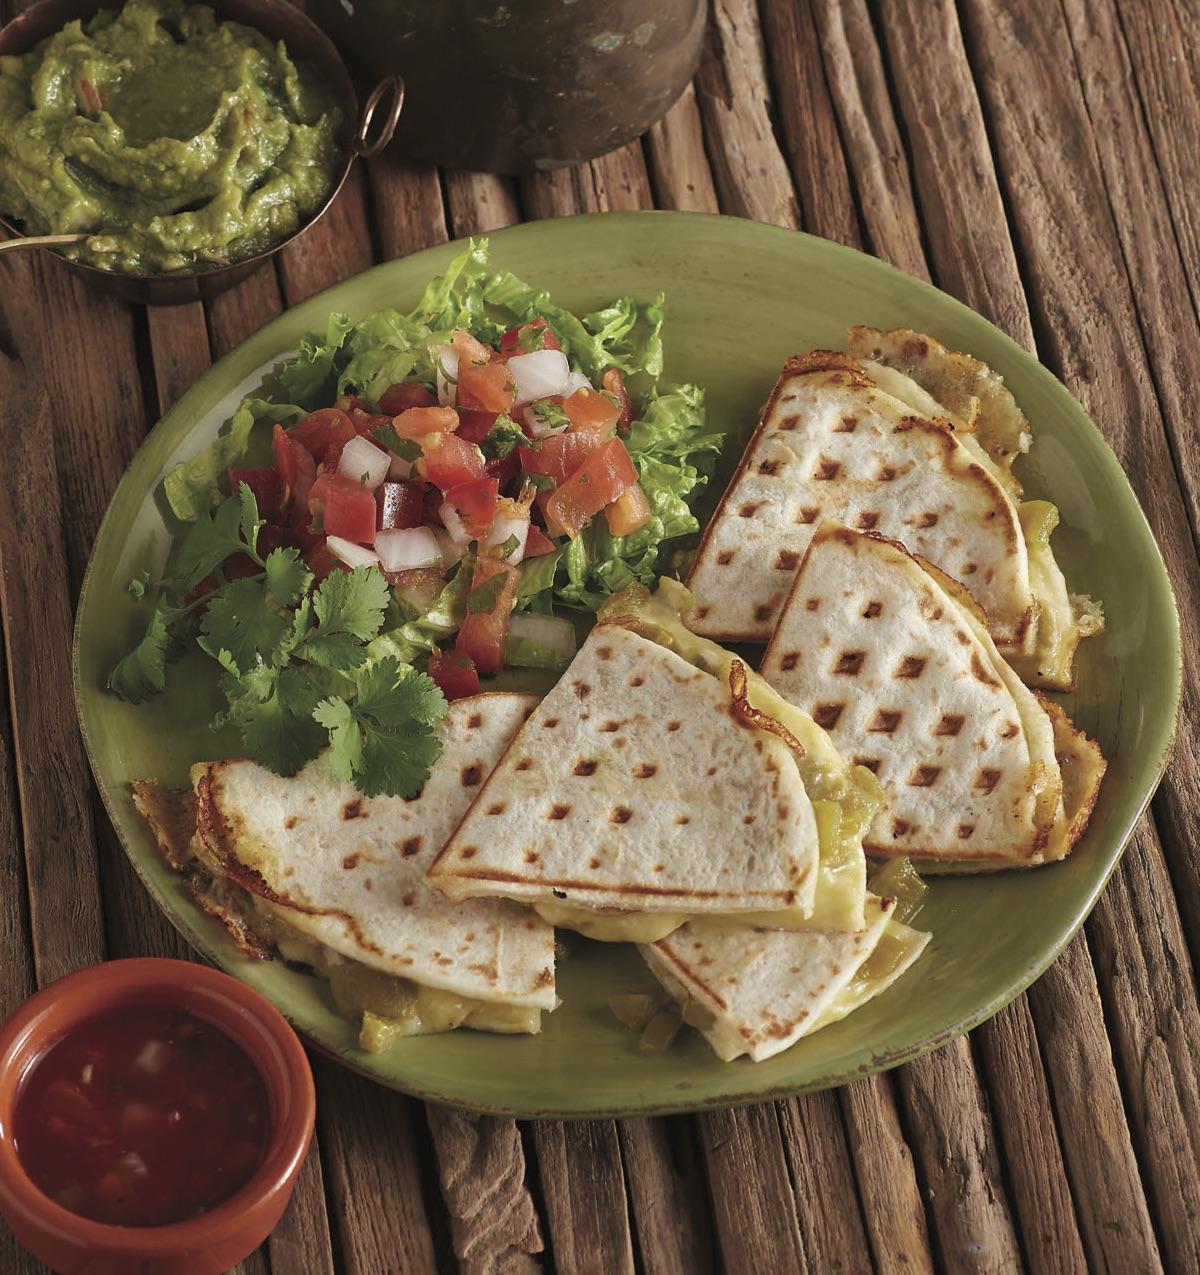 Green Chile Waffled Quesadillas - Workman Publishing